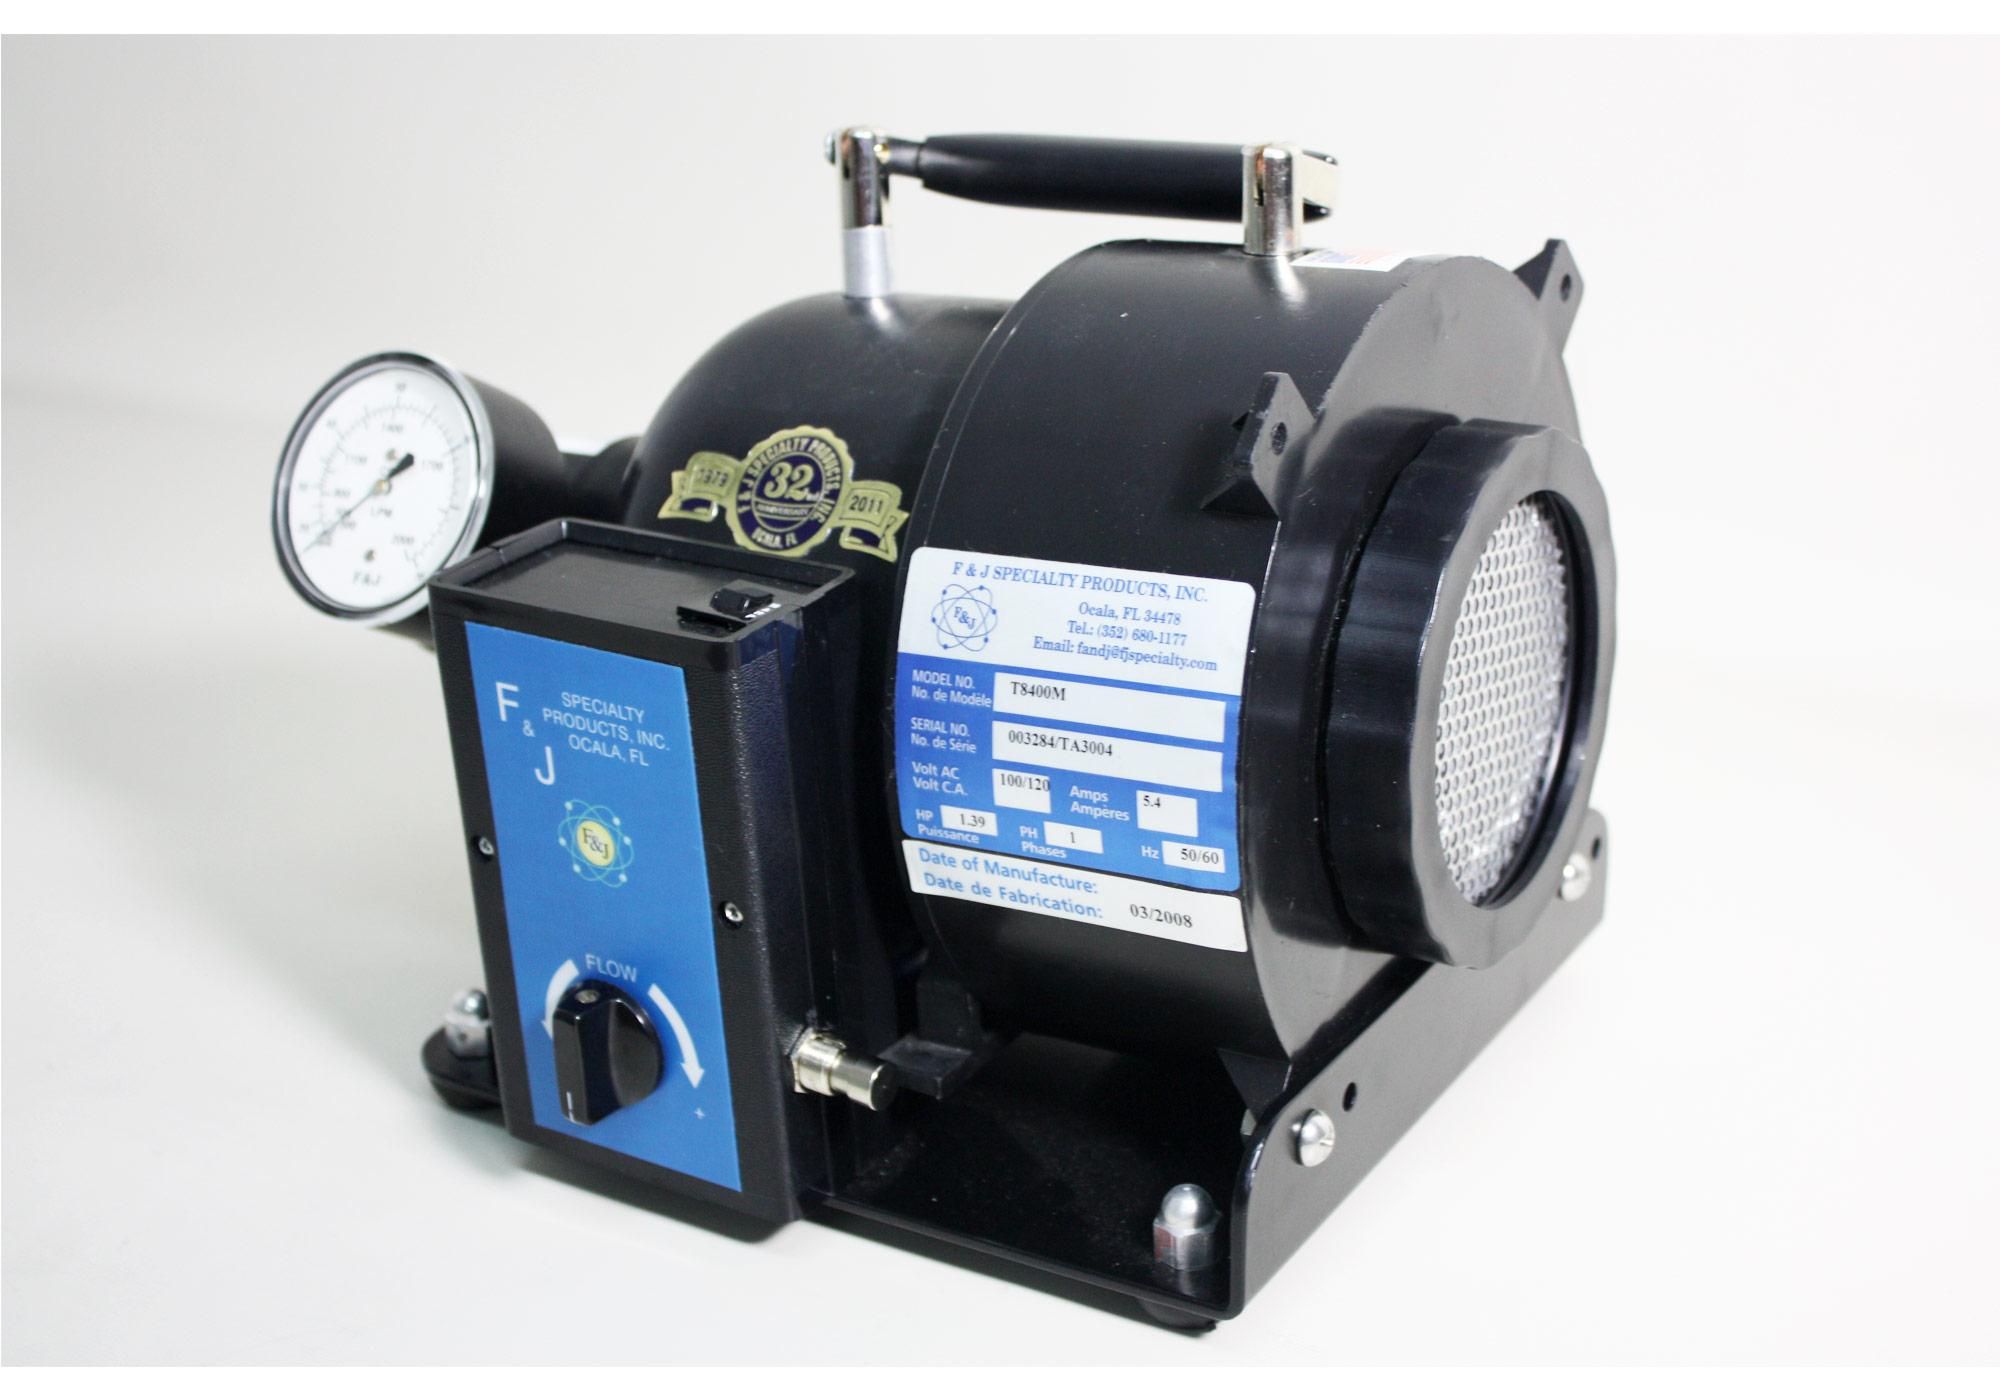 High Volume Air Blowers : T and e high volume air sampler fj specialty